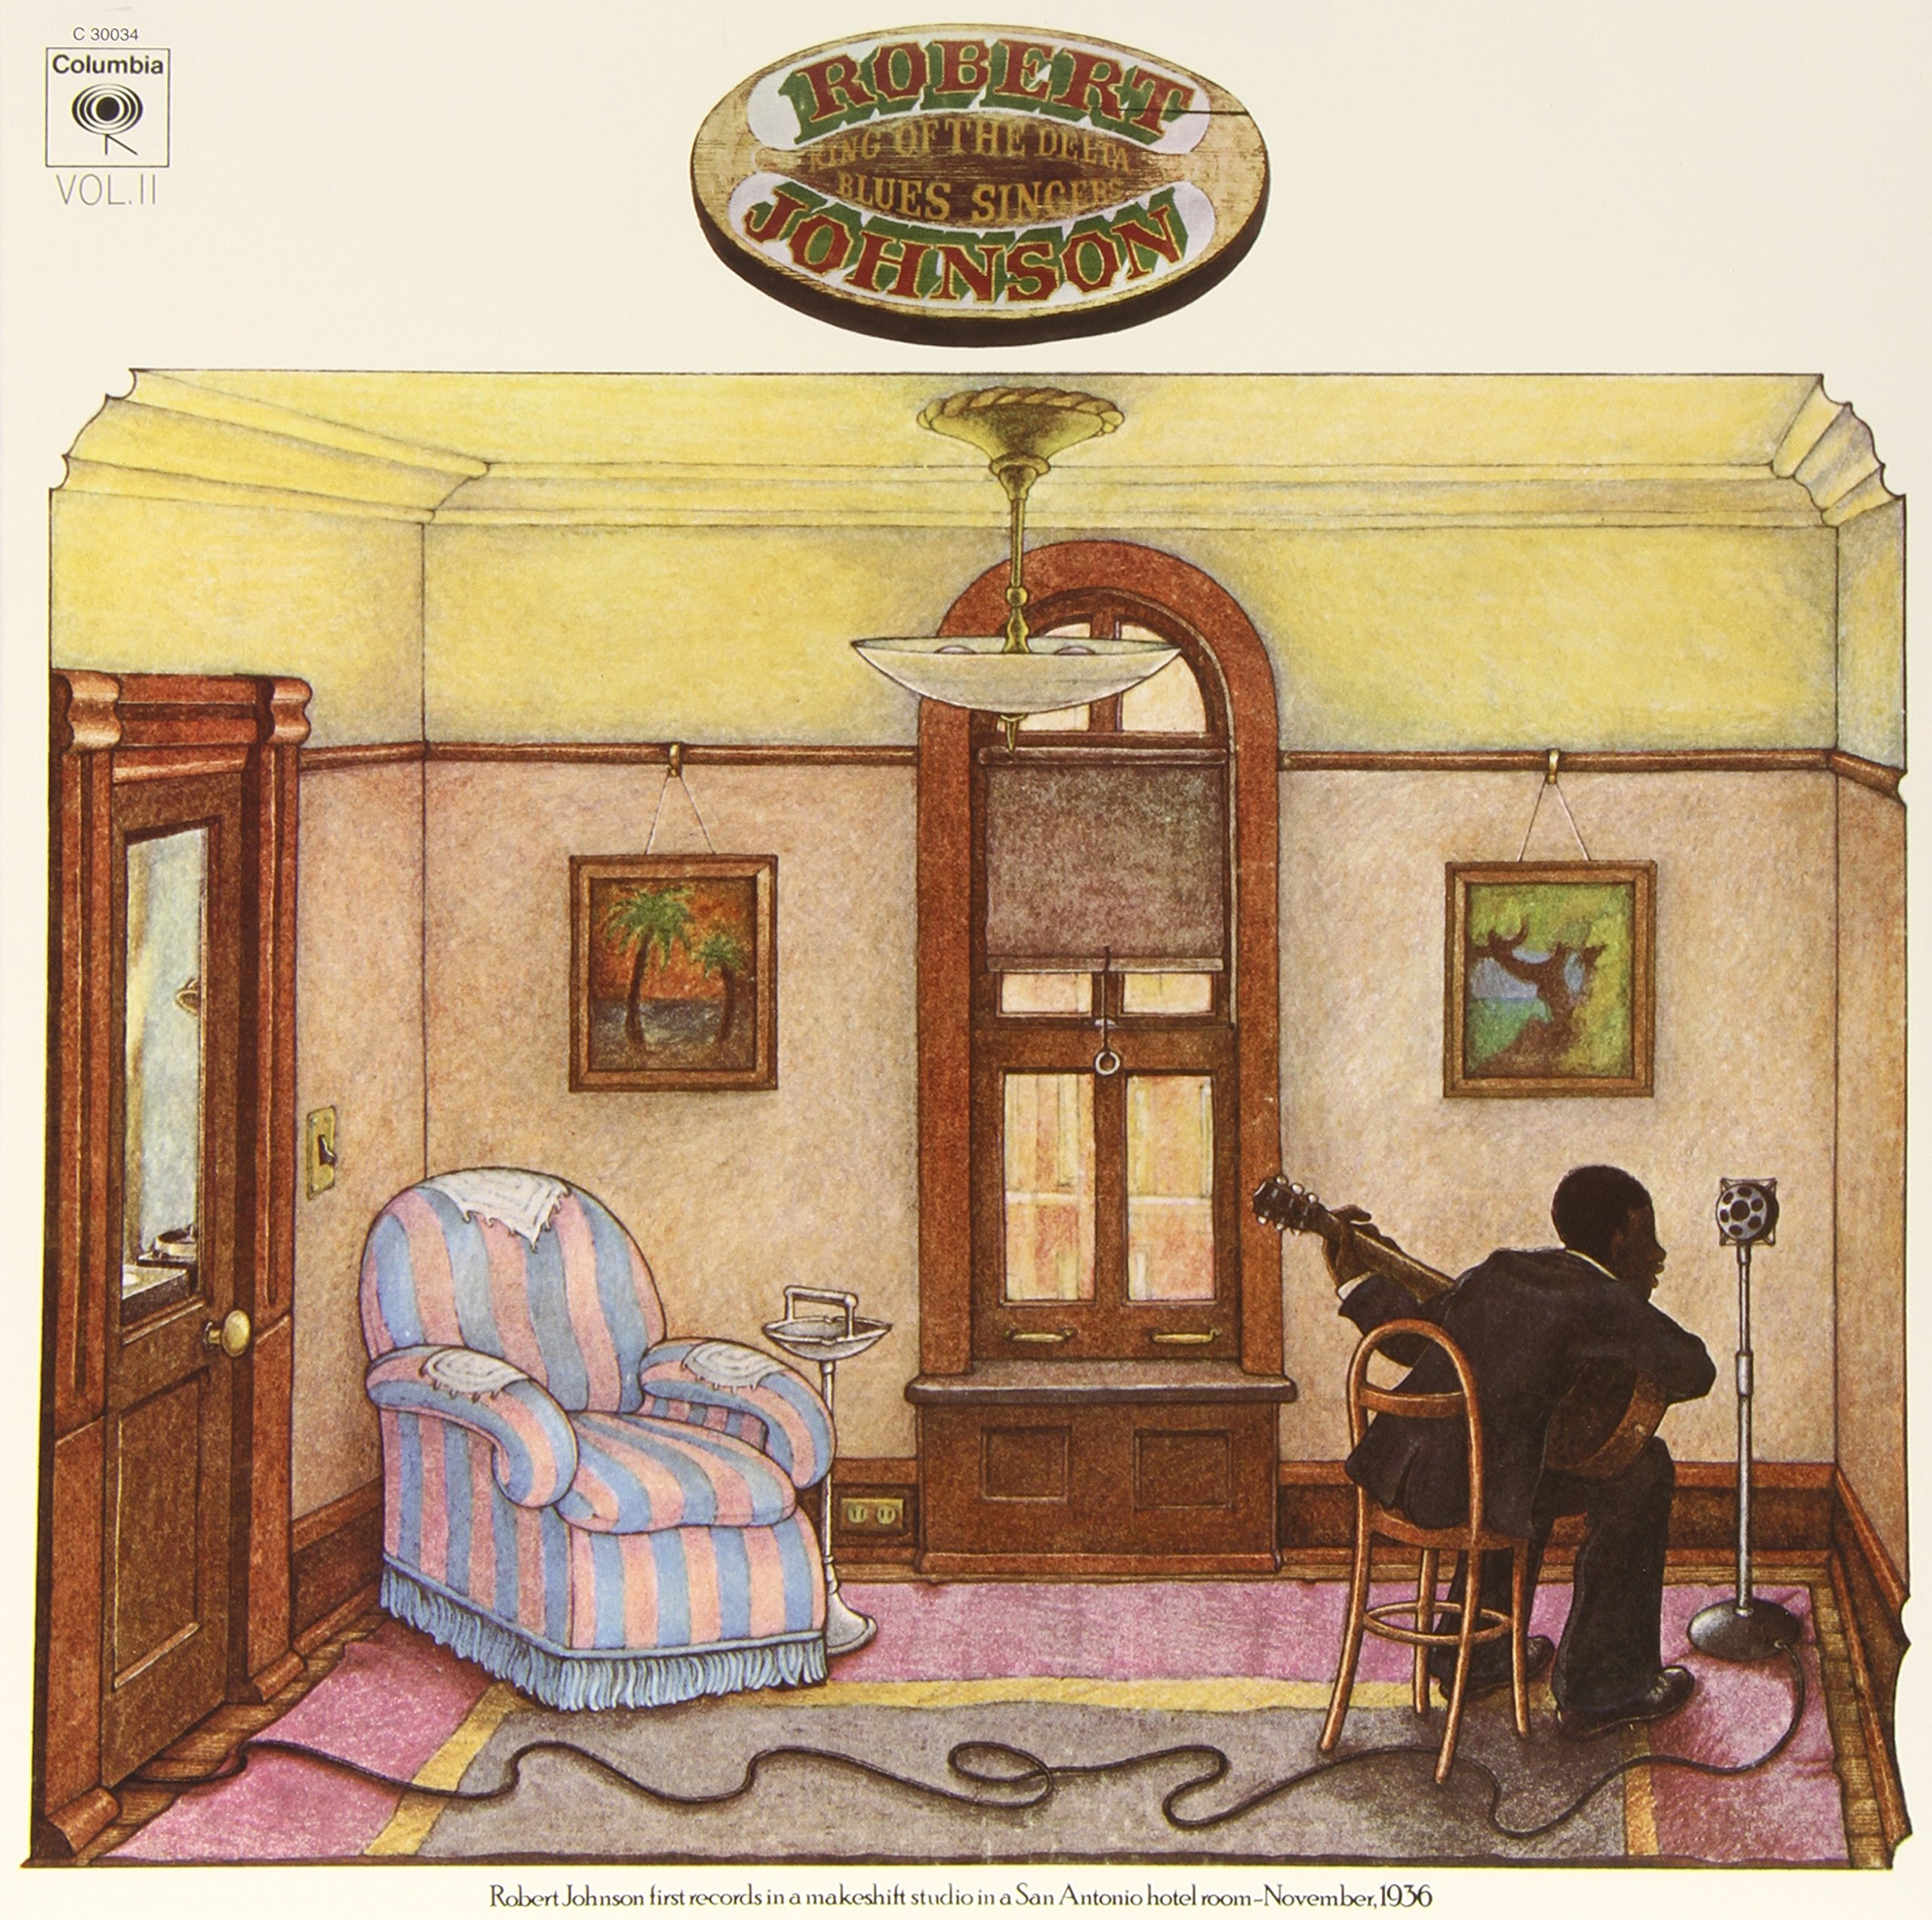 King Of The Delta Blues Singers Vol. II (180 Gram Vinyl) by Hi Horse